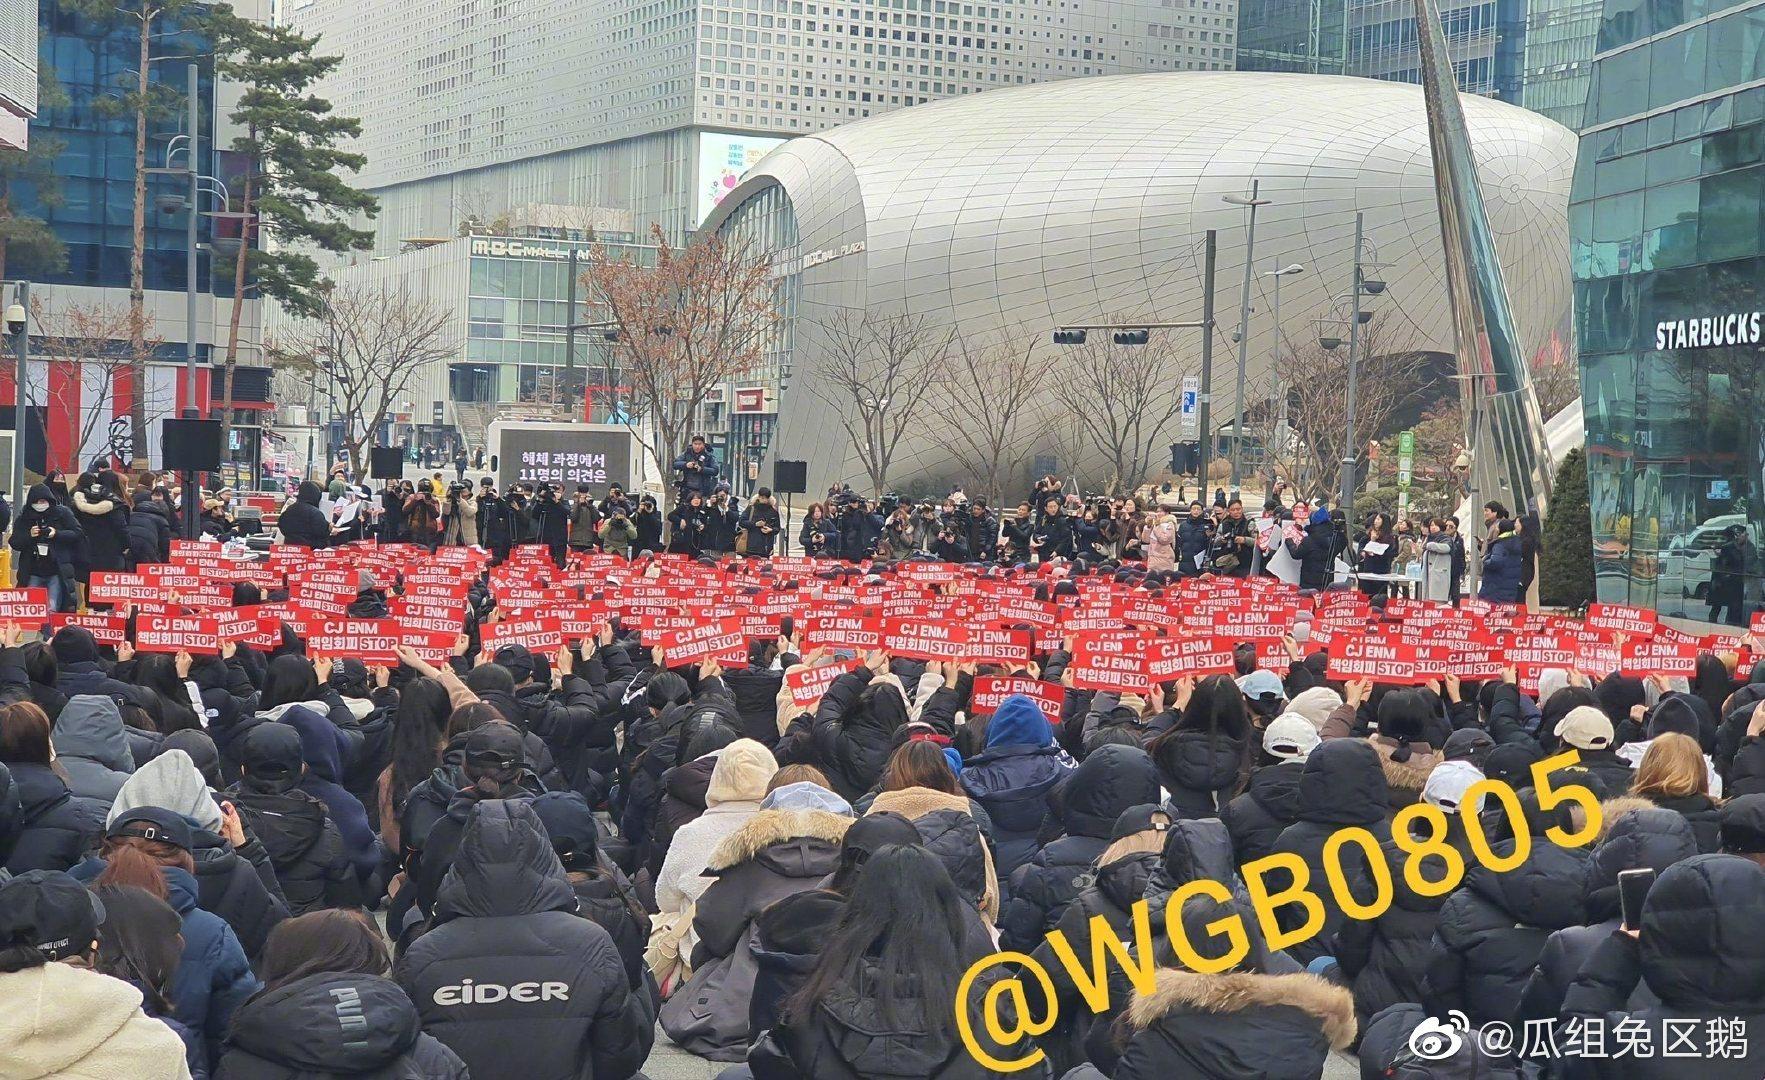 X1粉丝在CJ ENM门口举行谴责示威活动